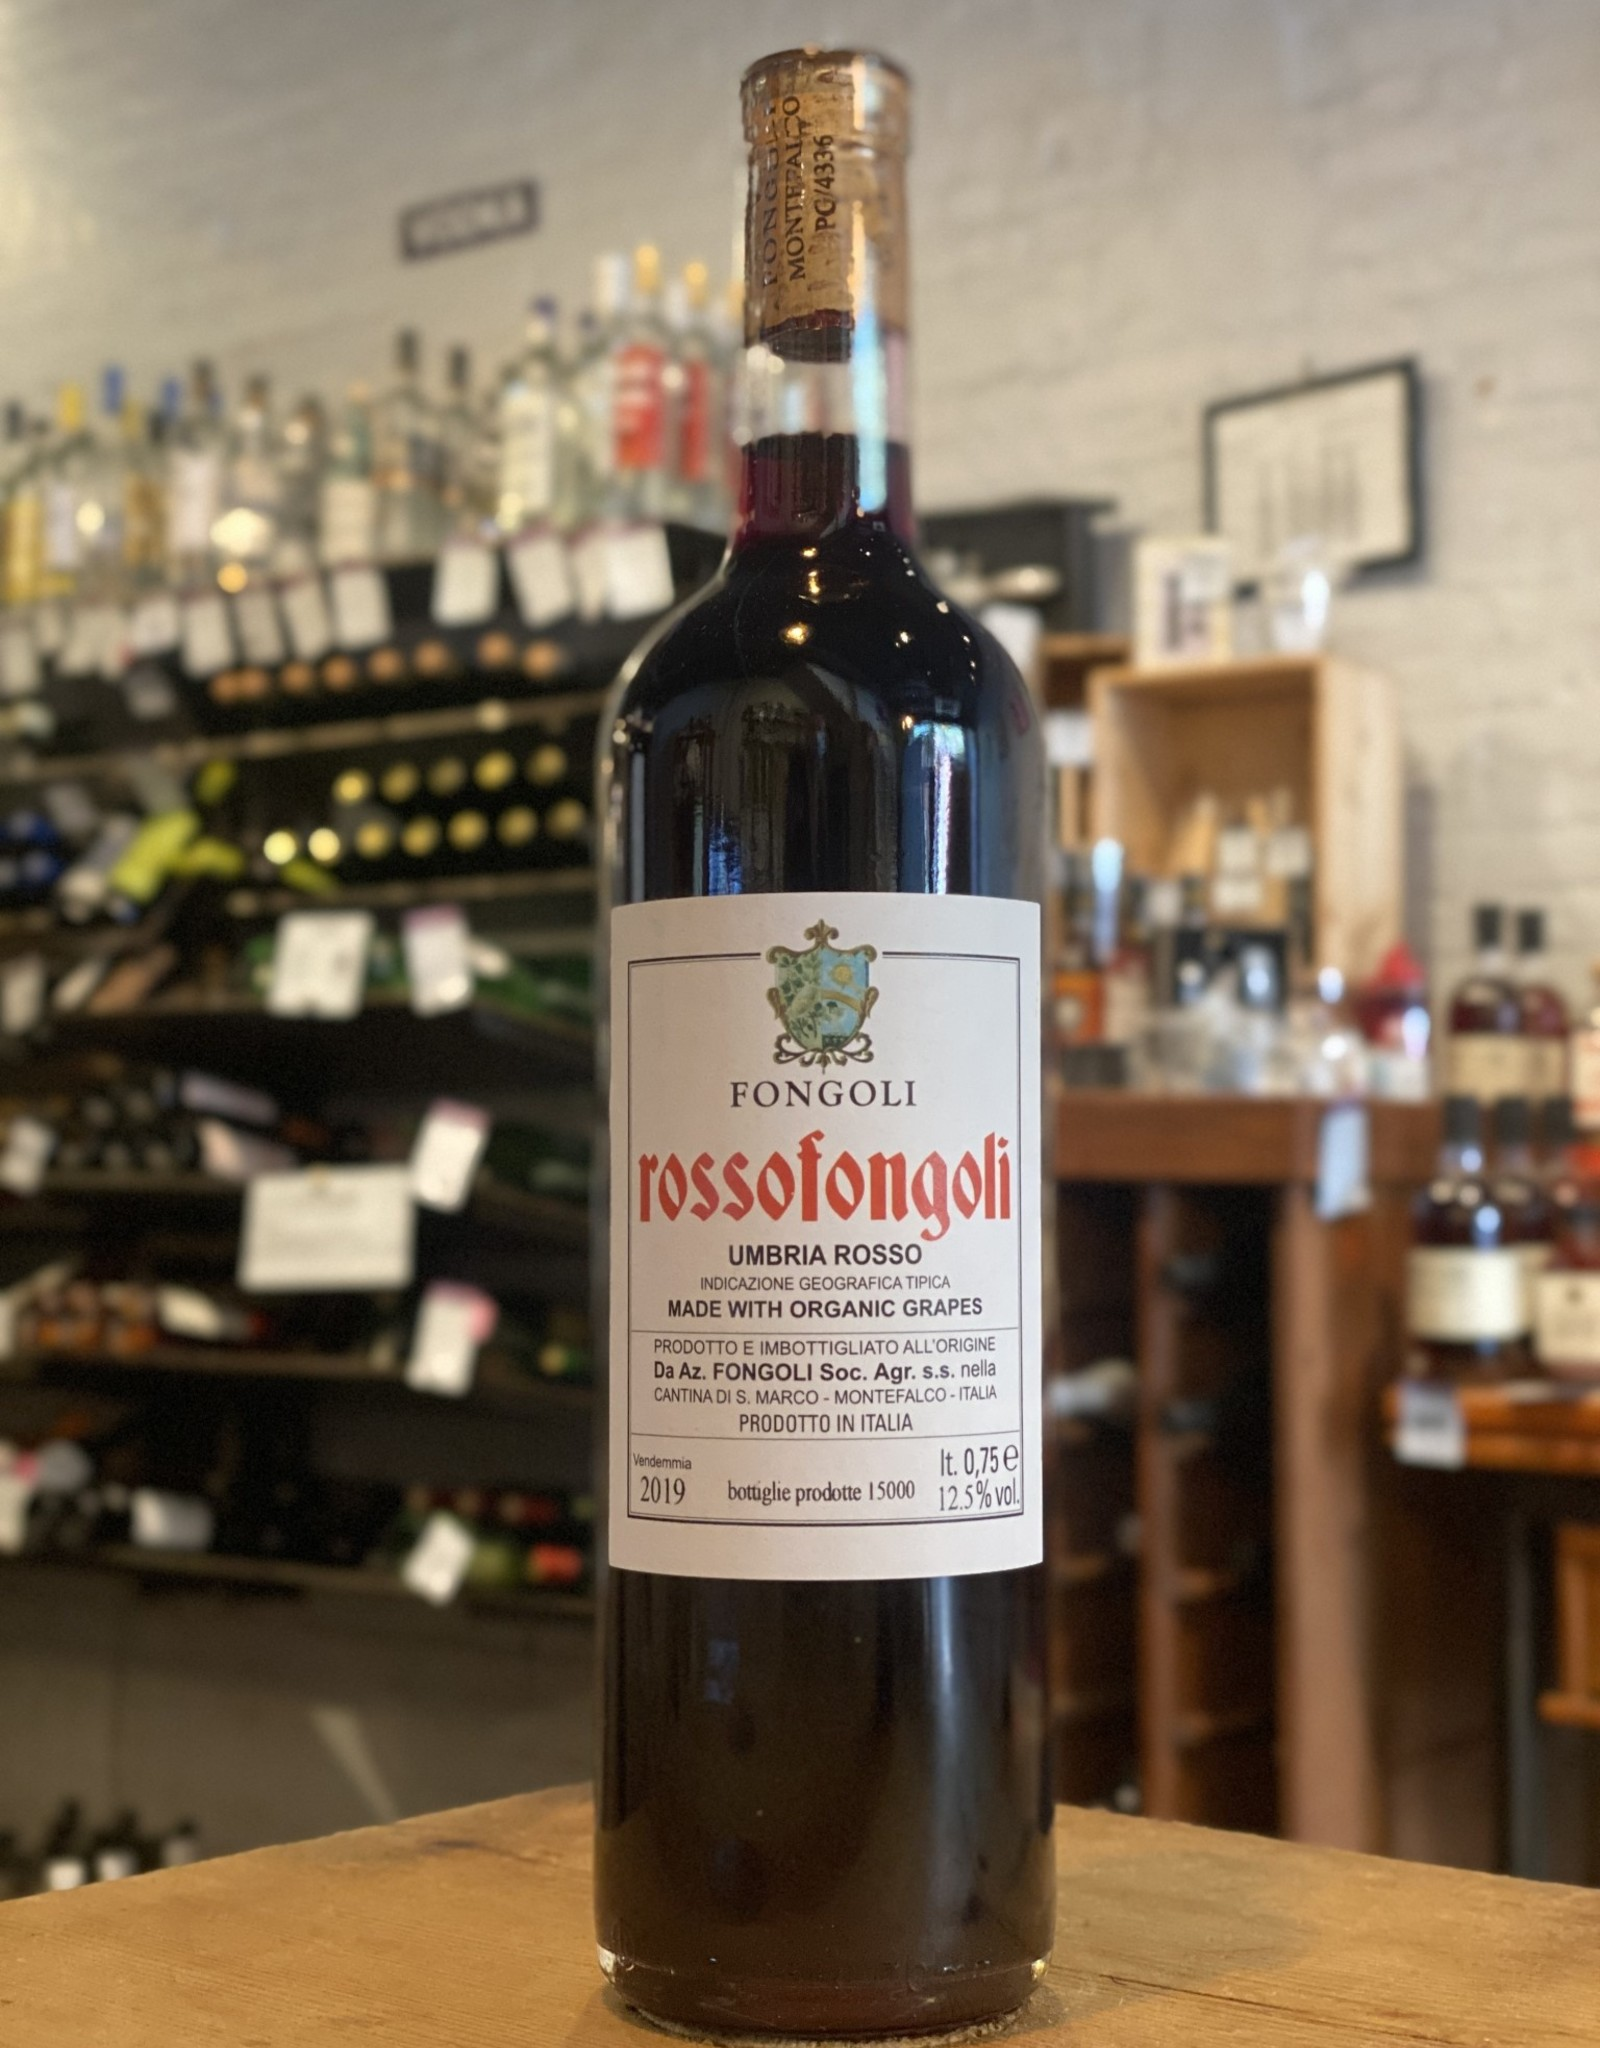 Wine 2019 Rossofongoli - Umbria, Italy (750ml)